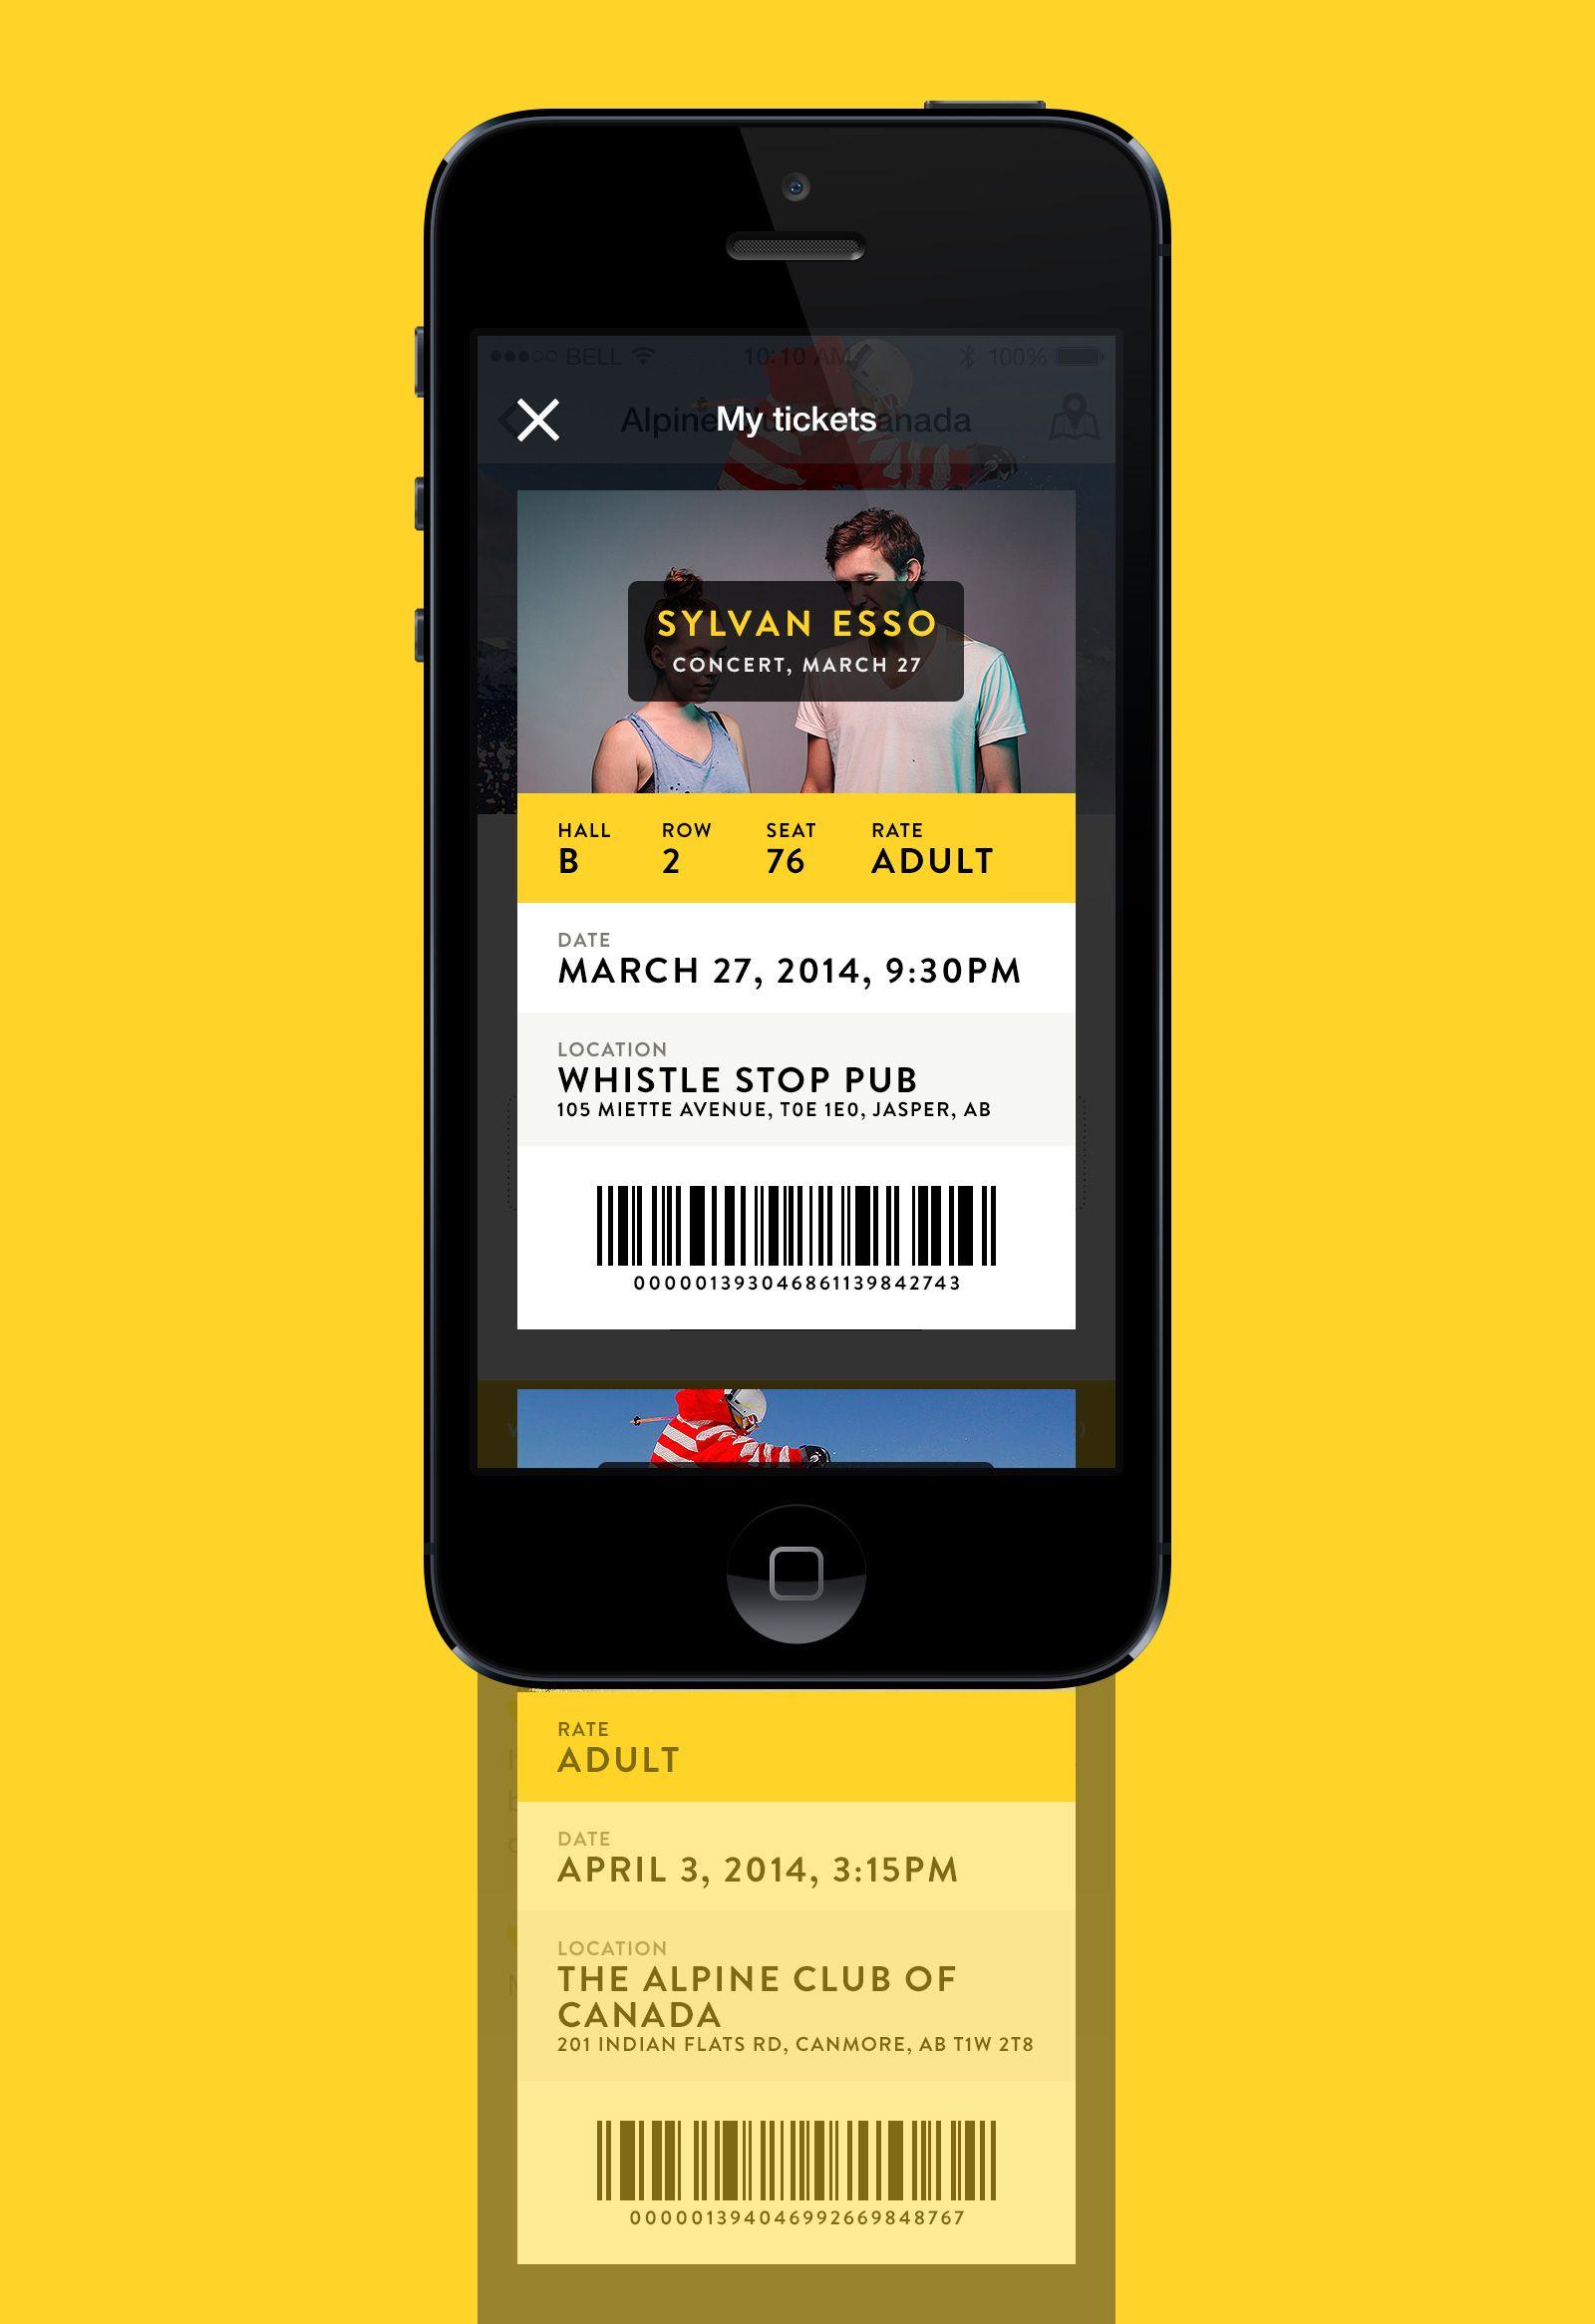 Tourism App Tickets listing UI Pinterest Tourism